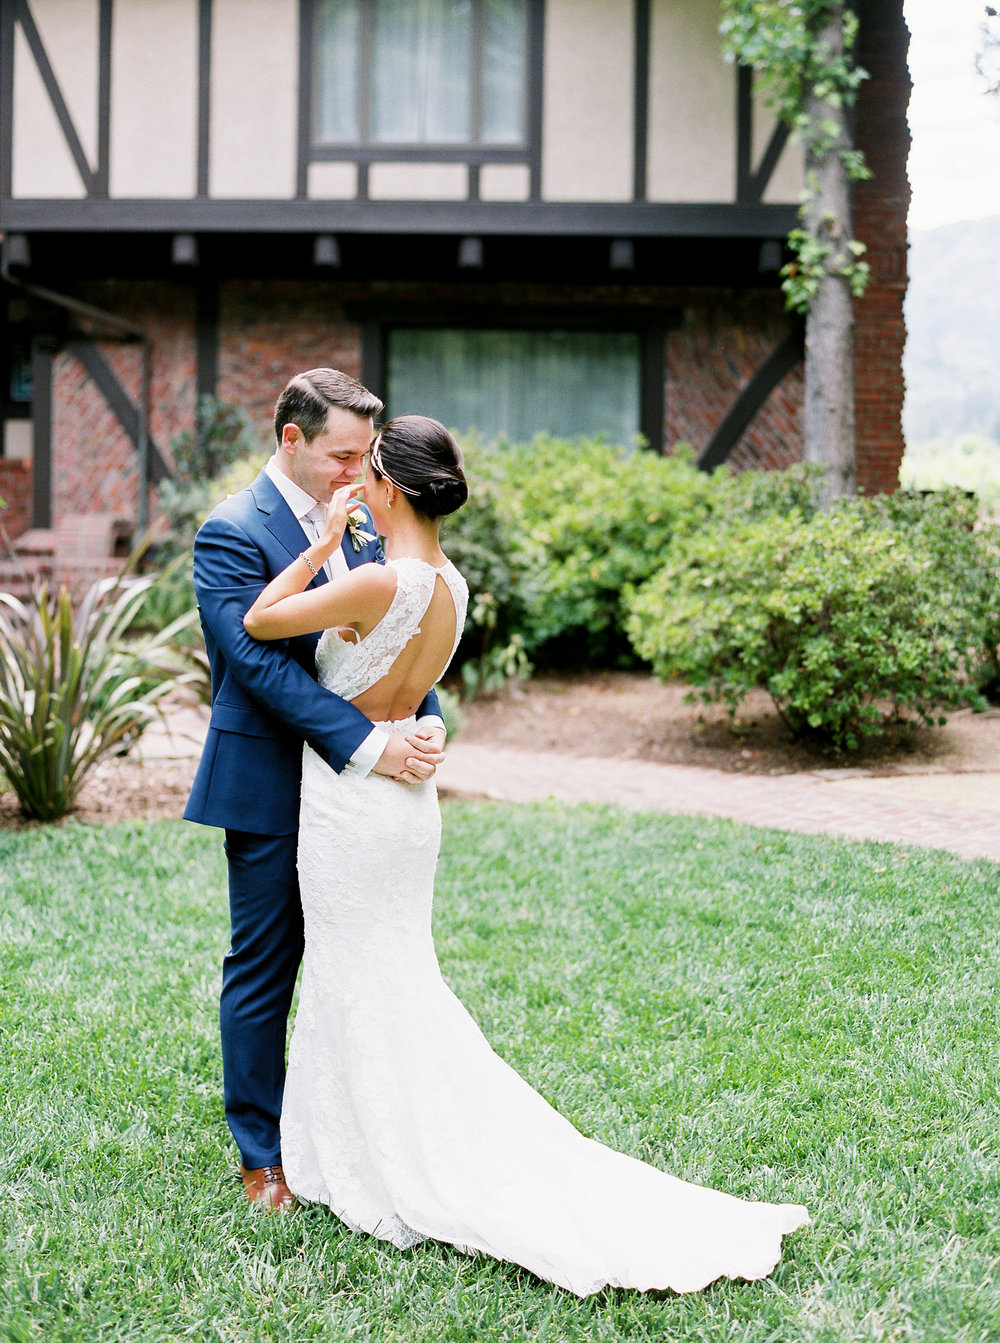 Harvest-inn-wedding-in-napa-california-252.jpg